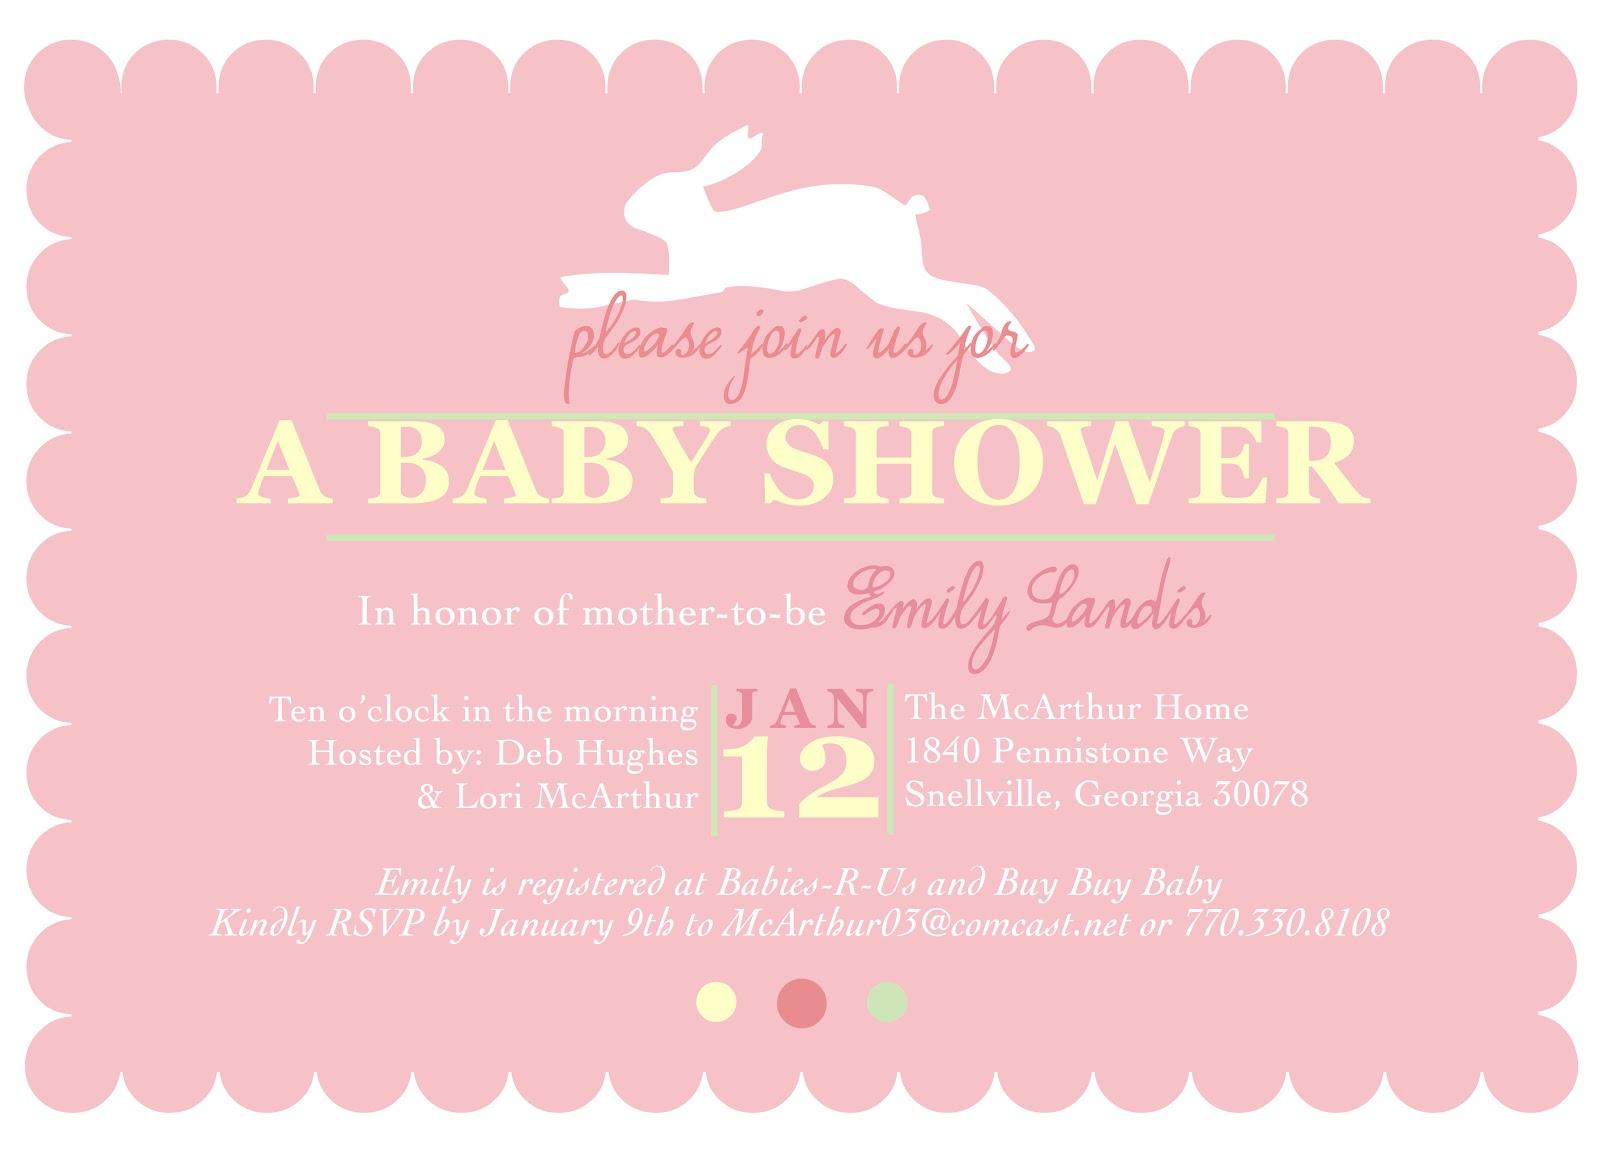 Shilo Lynn Prints: bunny: baby shower invitation